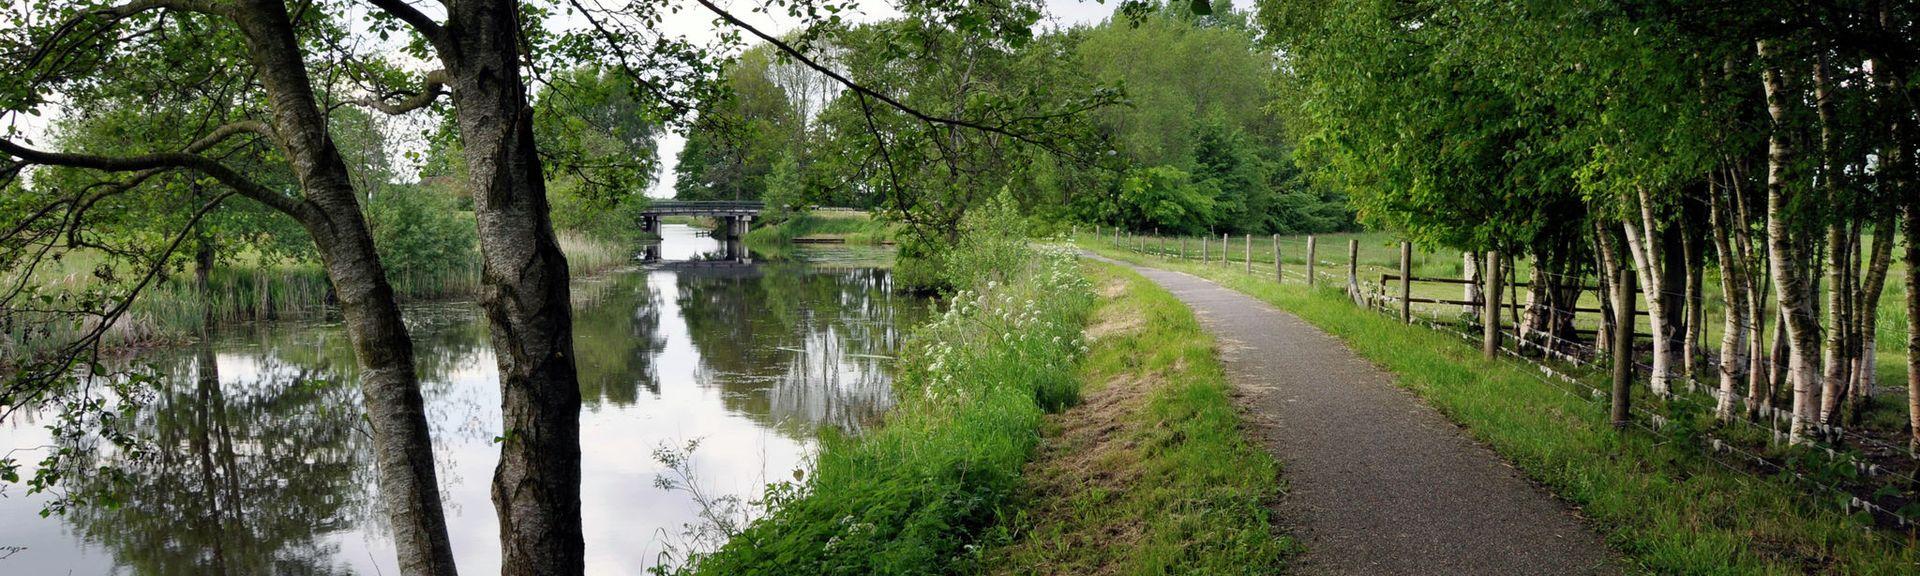 Diever, Drenthe, Netherlands